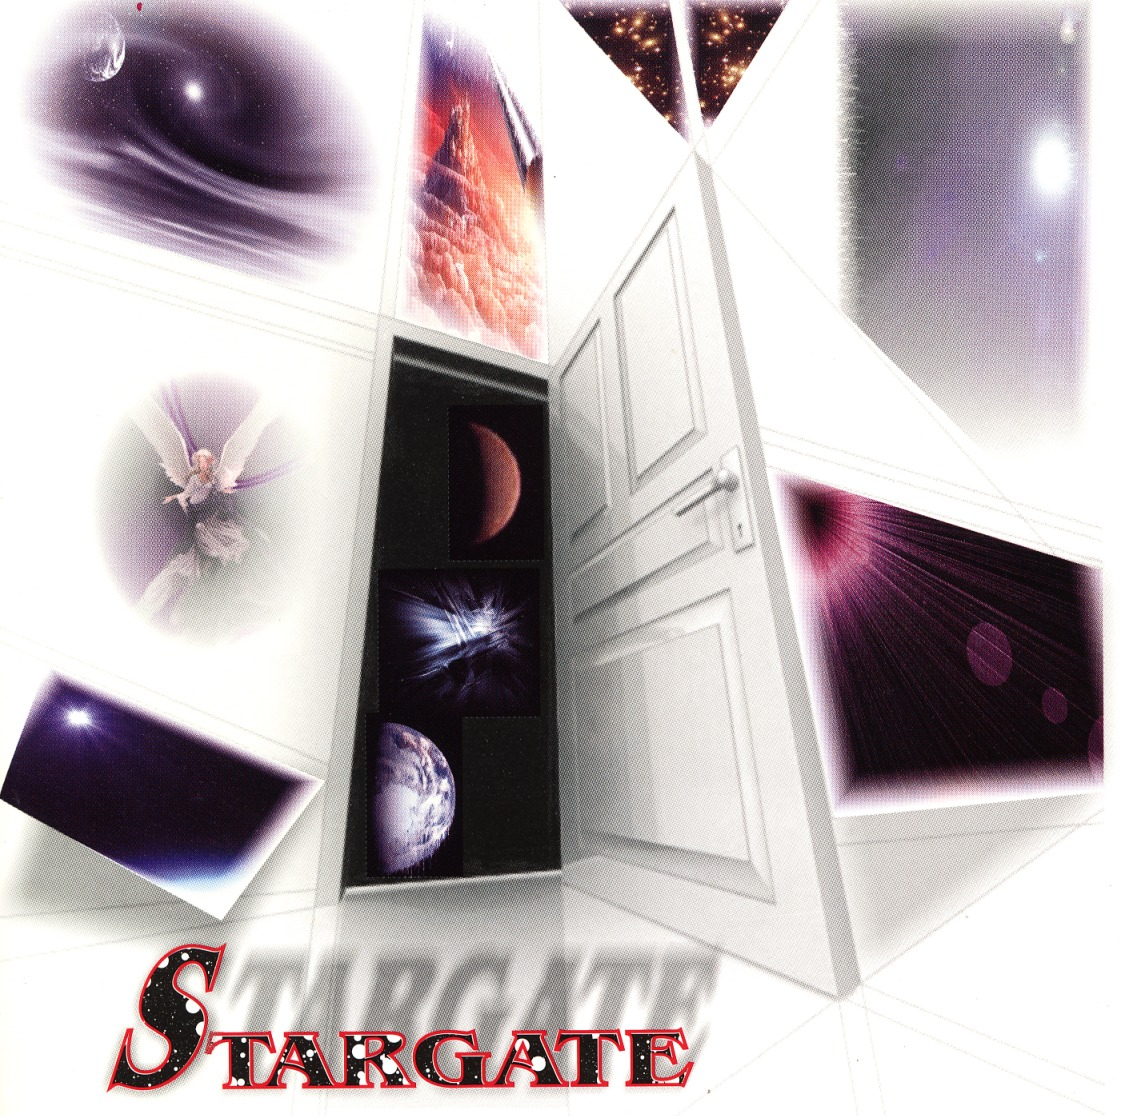 STARGATE (Greece) / Stargate